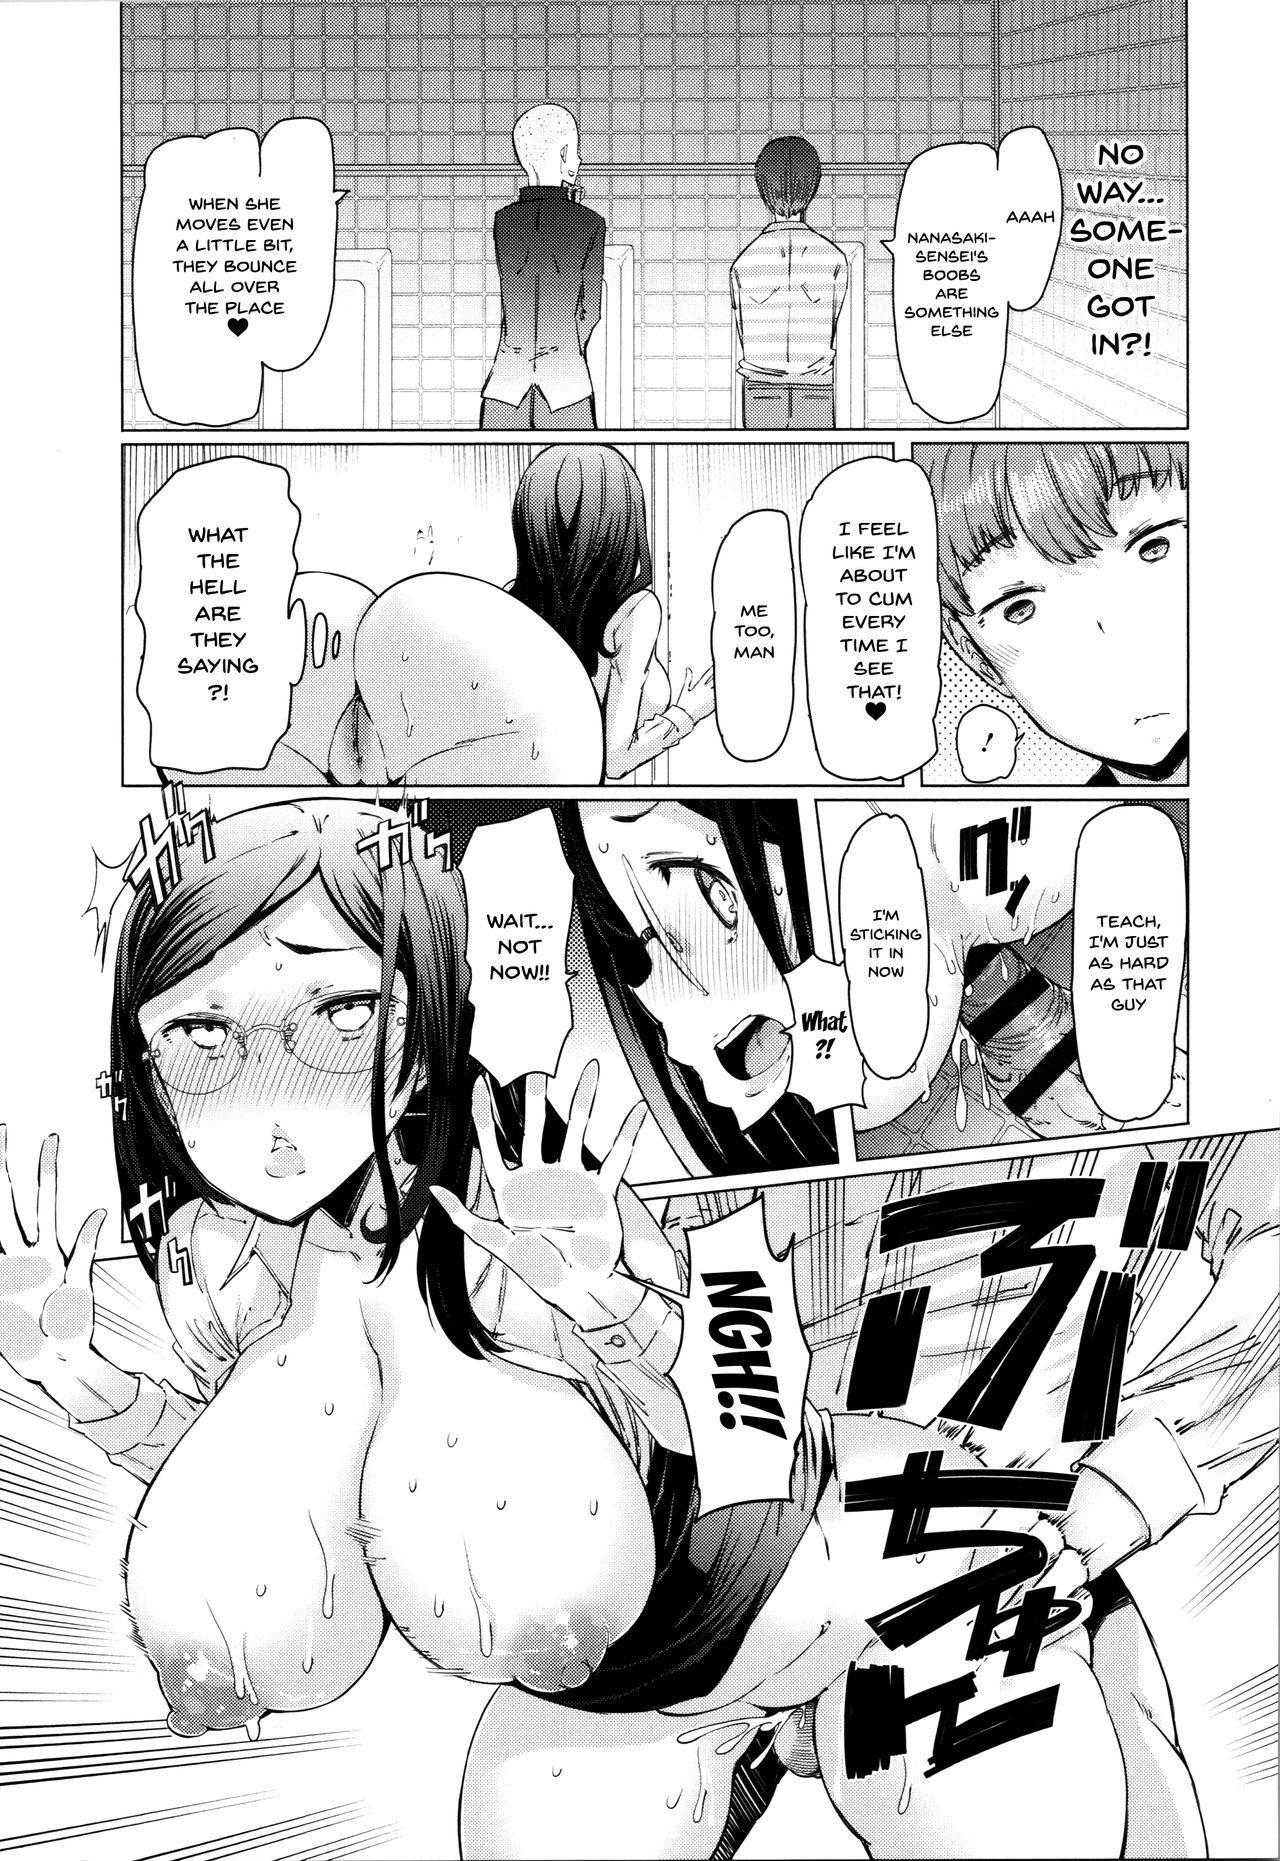 Hitozuma ga Ero Sugite Shigoto ni Naranai! | These Housewives Are Too Lewd I Can't Help It! Ch.1-7 52